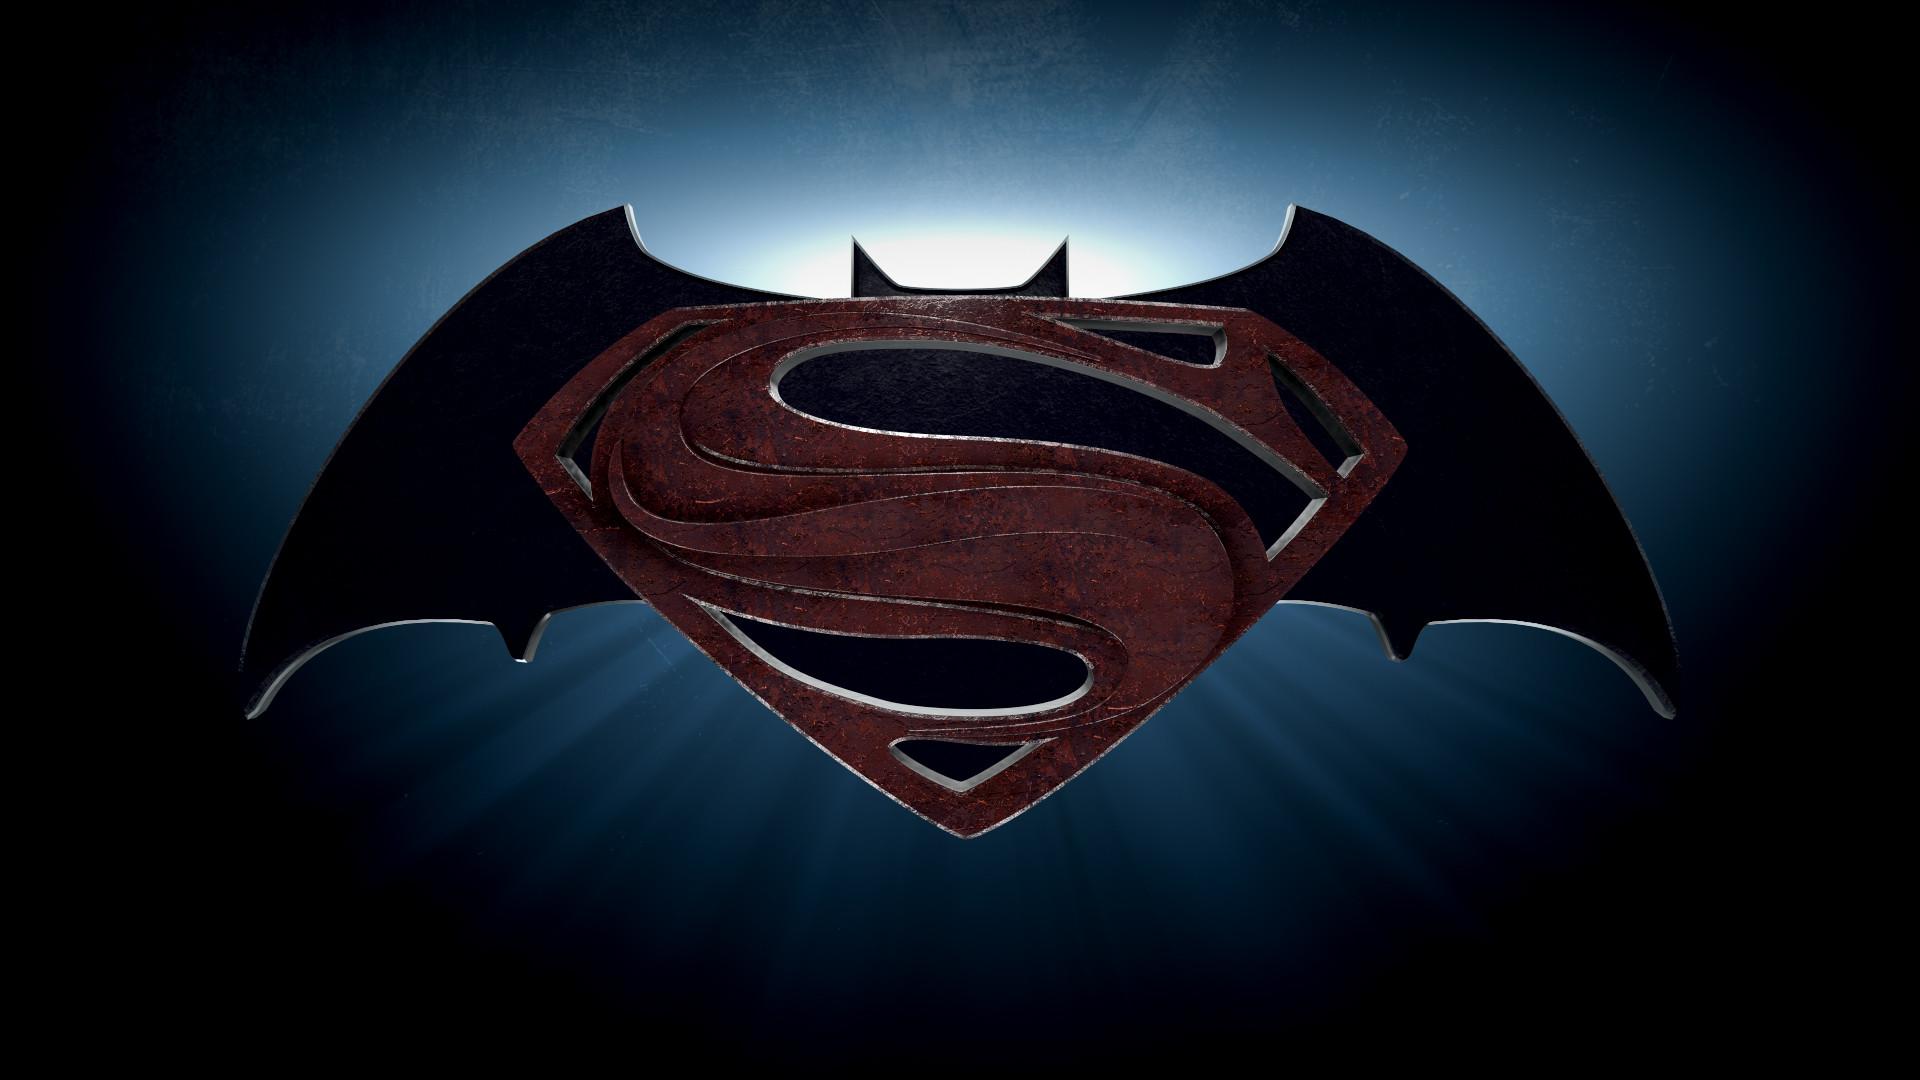 Batman v Superman 2015 Movie Logo HD Wallpaper   Stylish HD Wallpapers 1920x1080